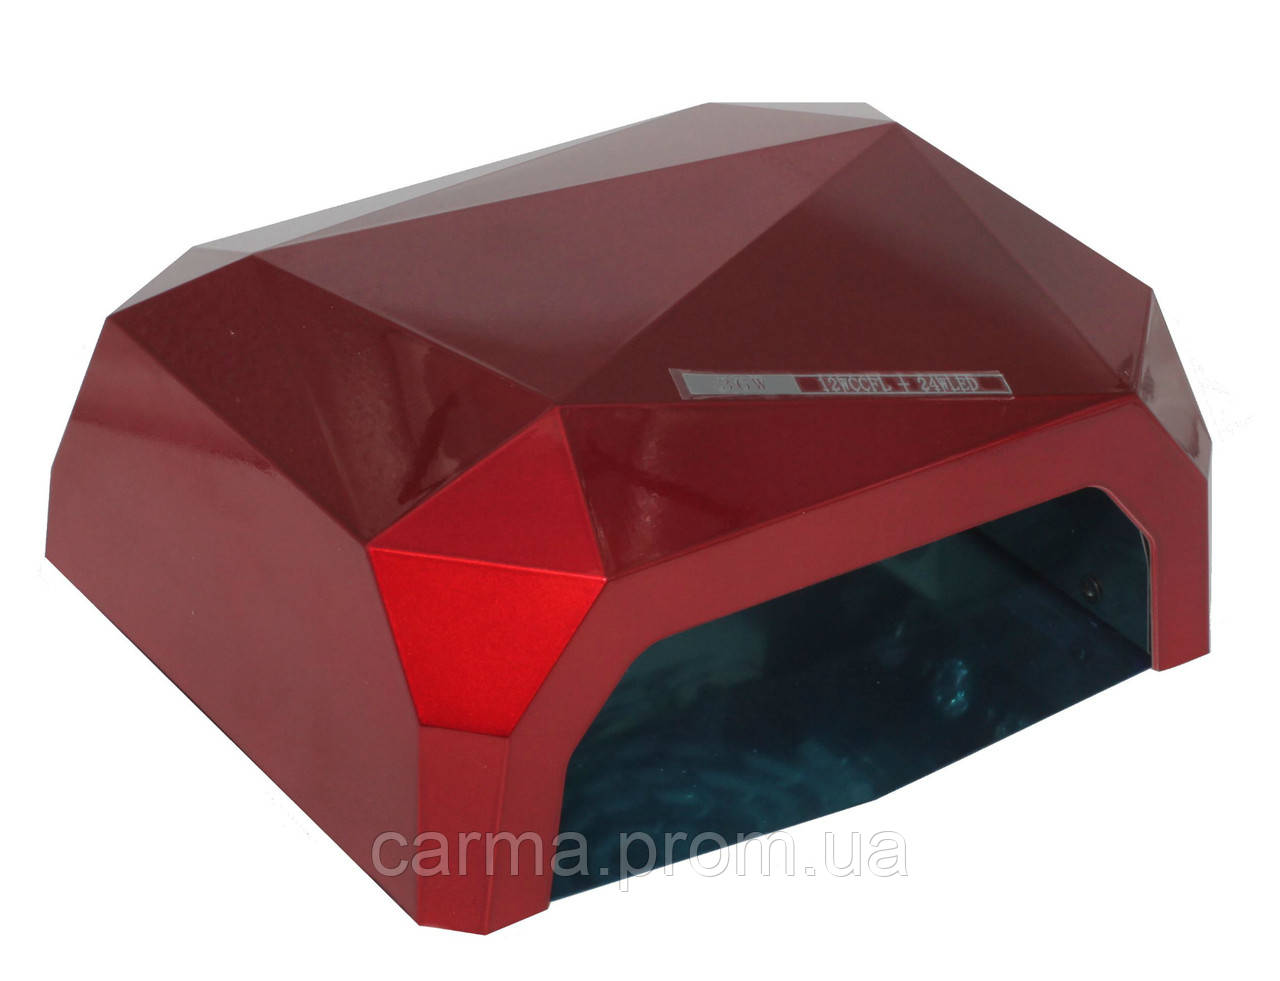 Лампа для маникюра гибридная DIAMOND CCFL+LED 36W Красная